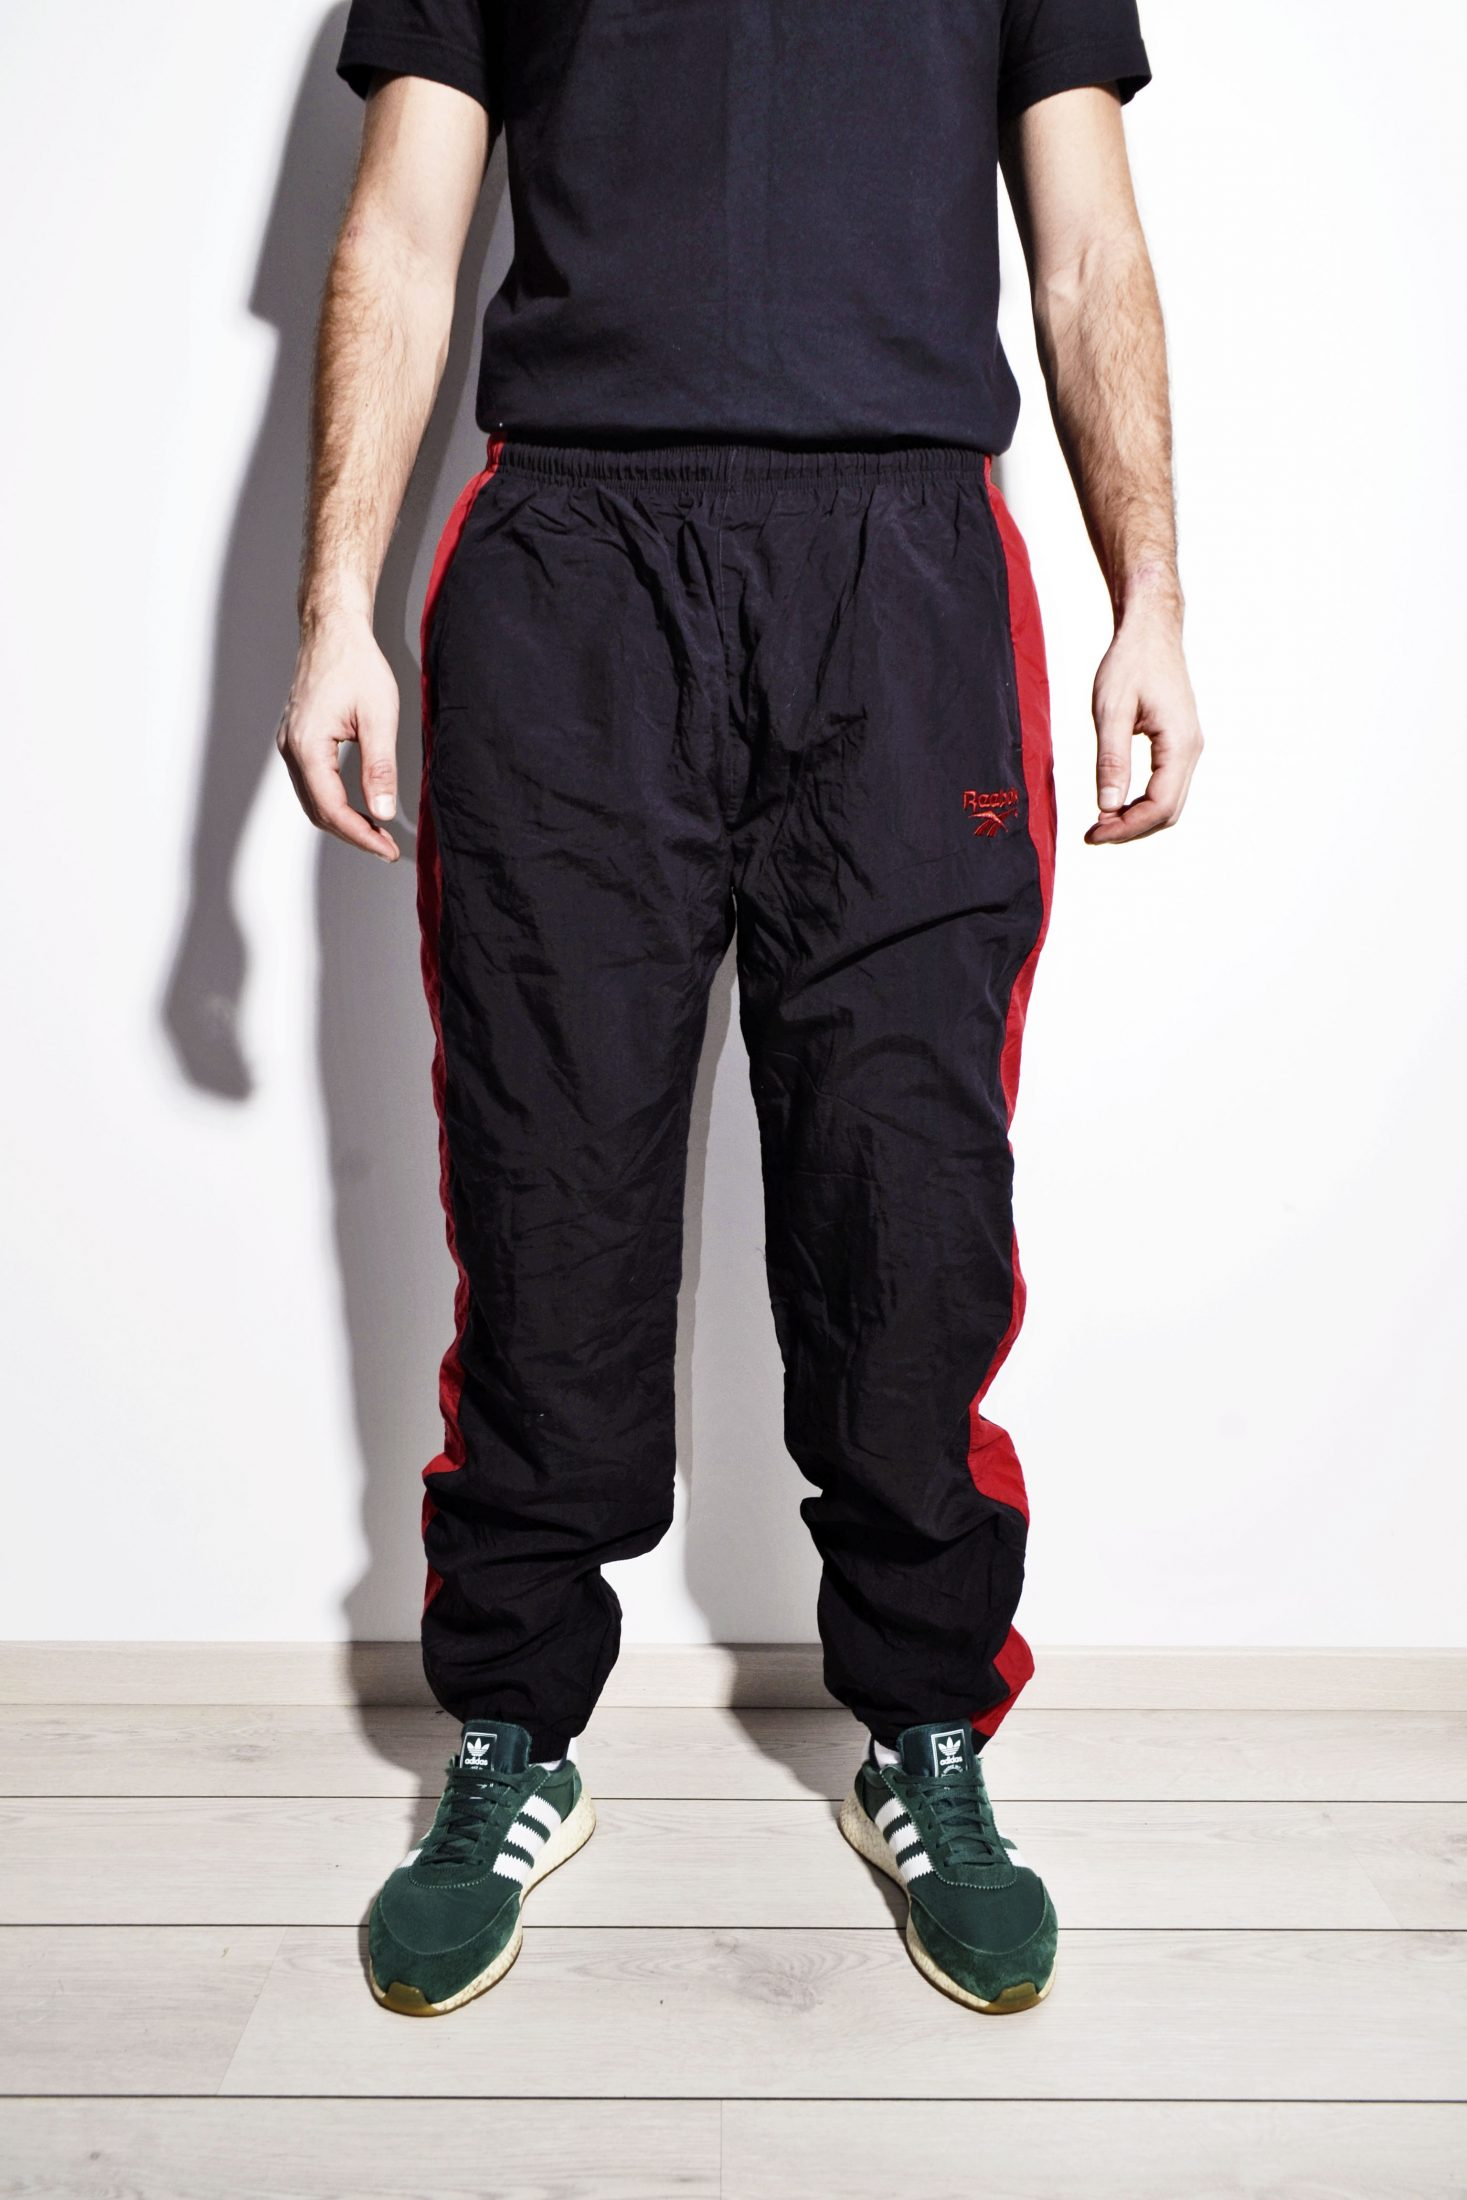 c930374d848c Reebok vintage wind pants orange men   HOT MILK vintage clothing online